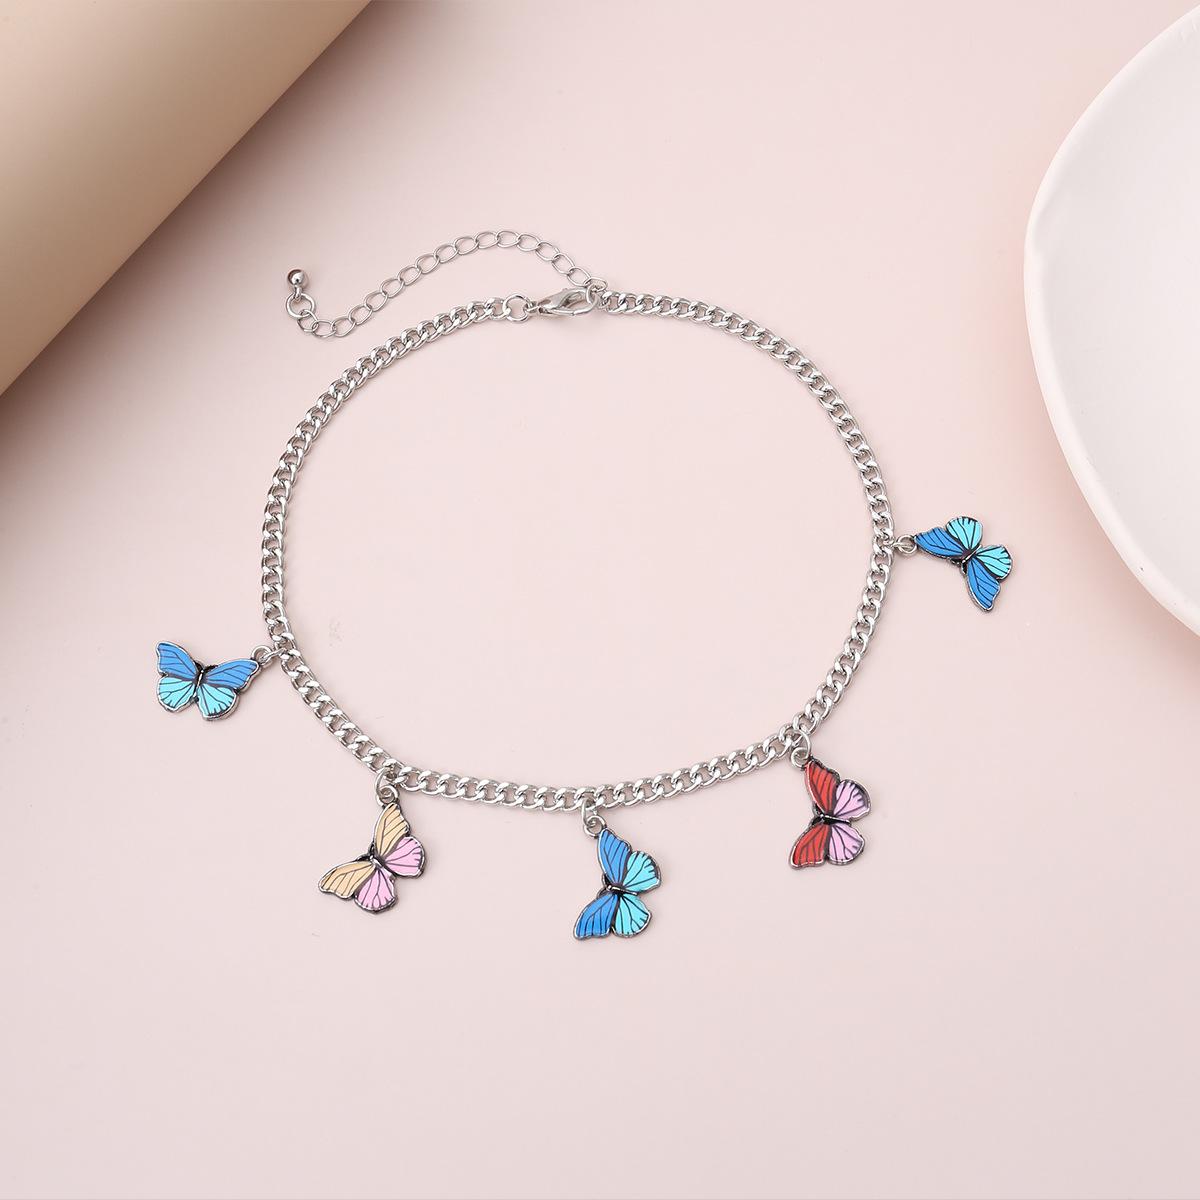 jewelry design frosty style necklace feminine butterfly contrast color tassel pendant necklace wholesale nihaojewelry NHXR229173